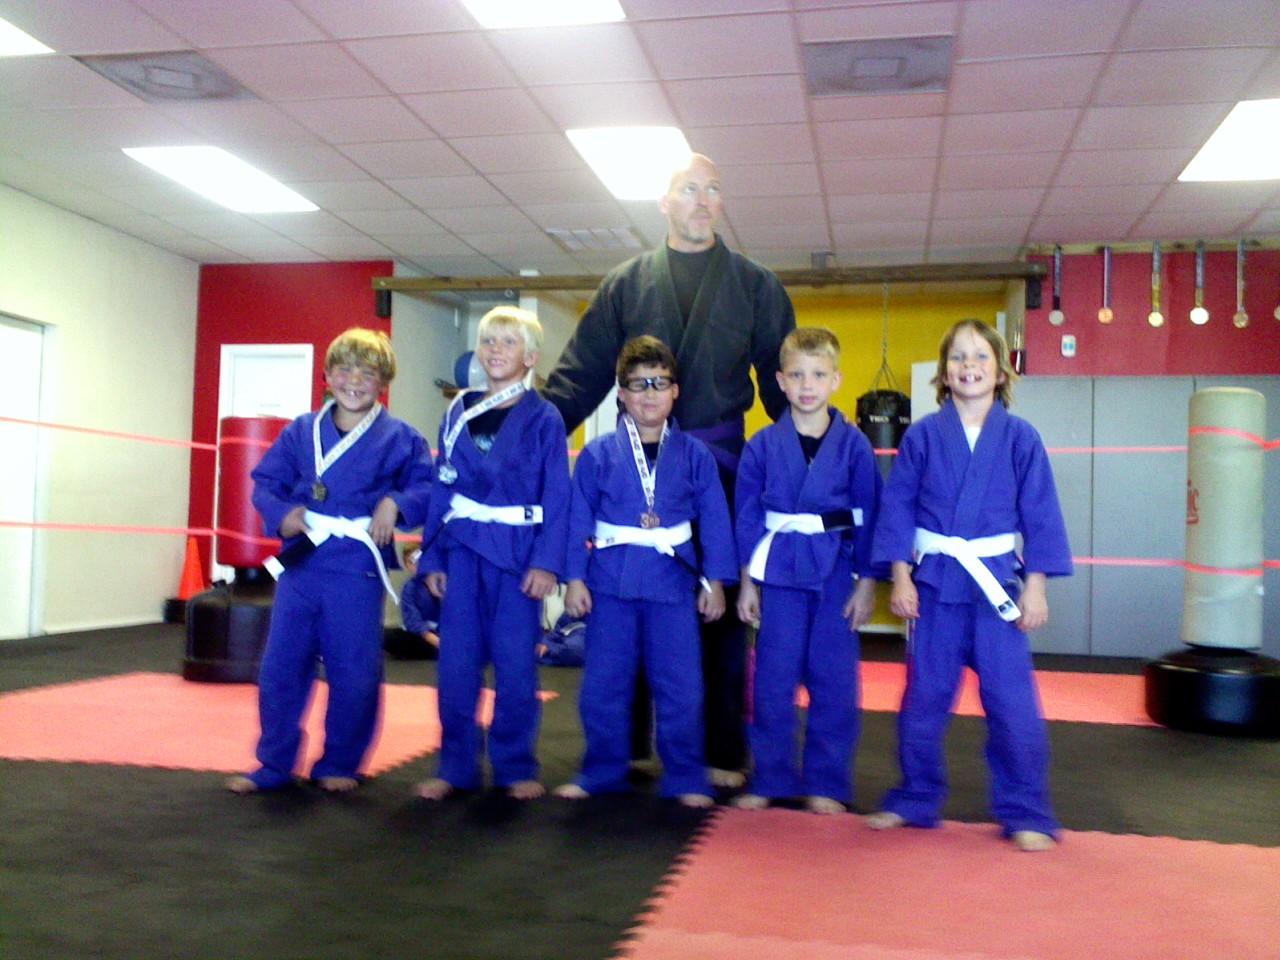 Our Lightweight Jiu Jitsu Competitors